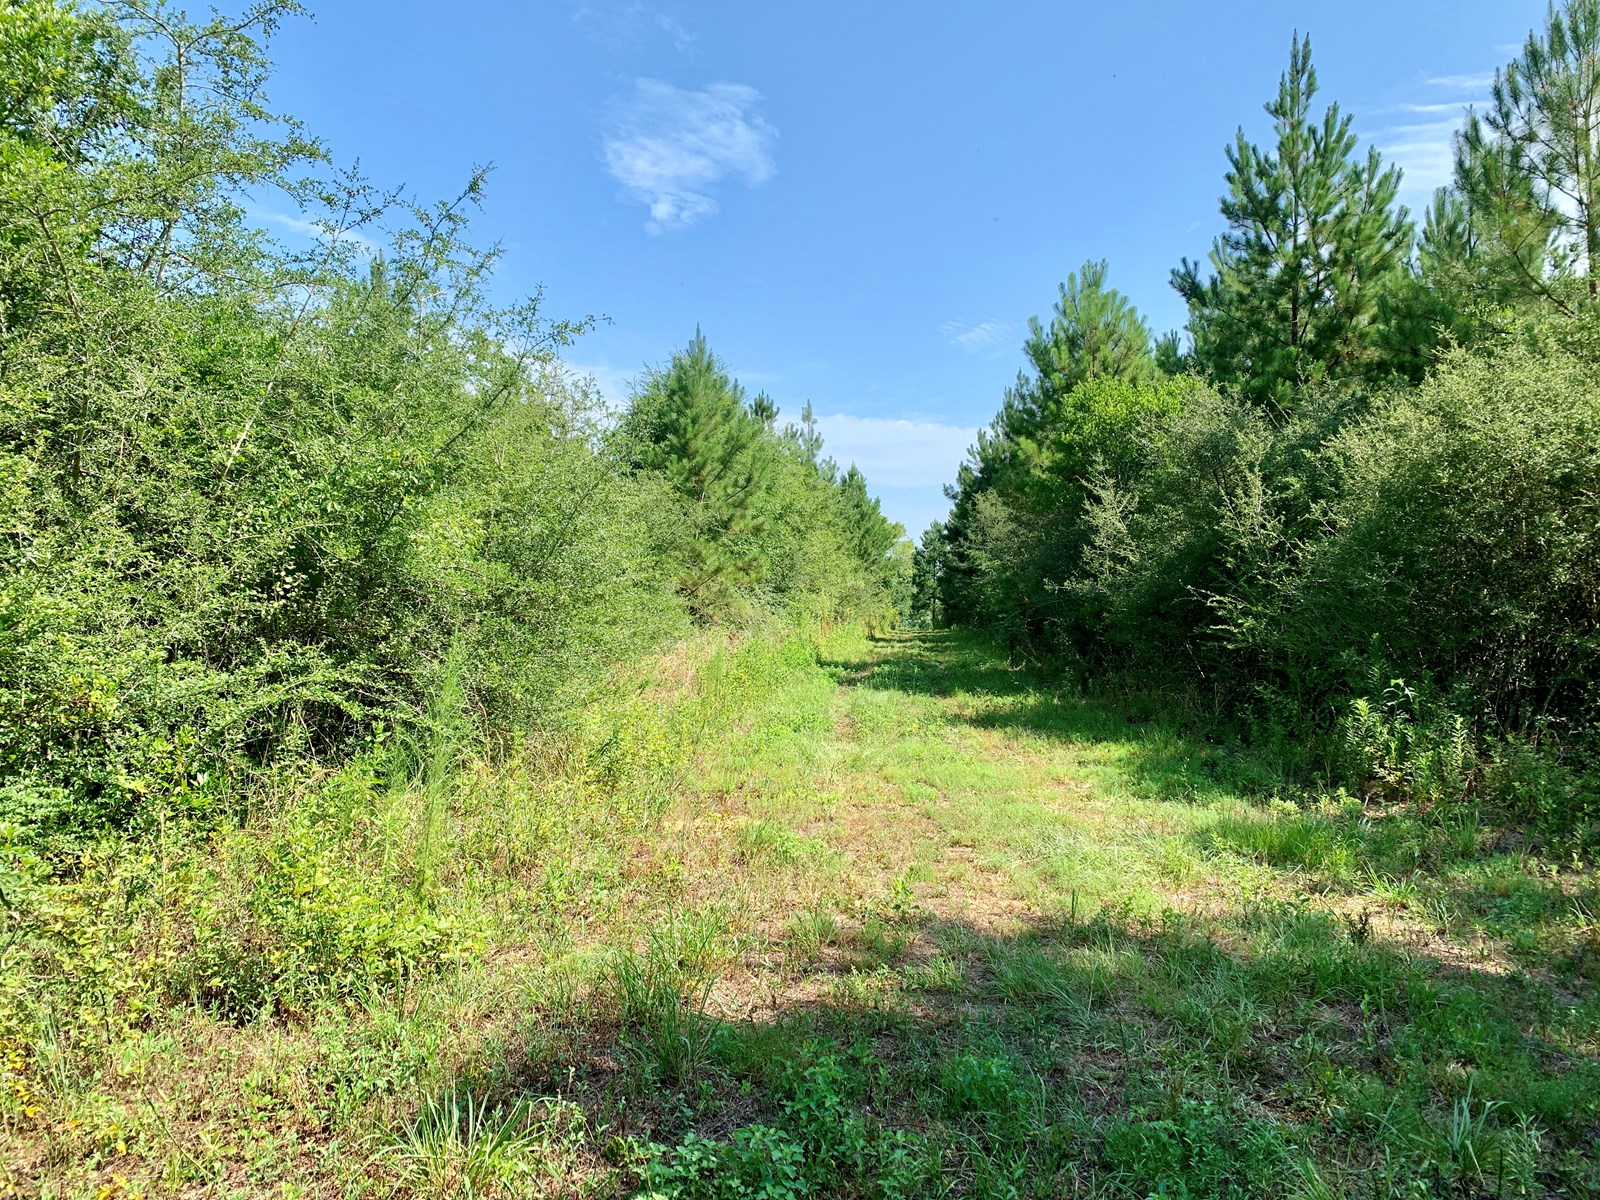 107 Acres Deer Hunting Land - Recreational Tract - Black Al